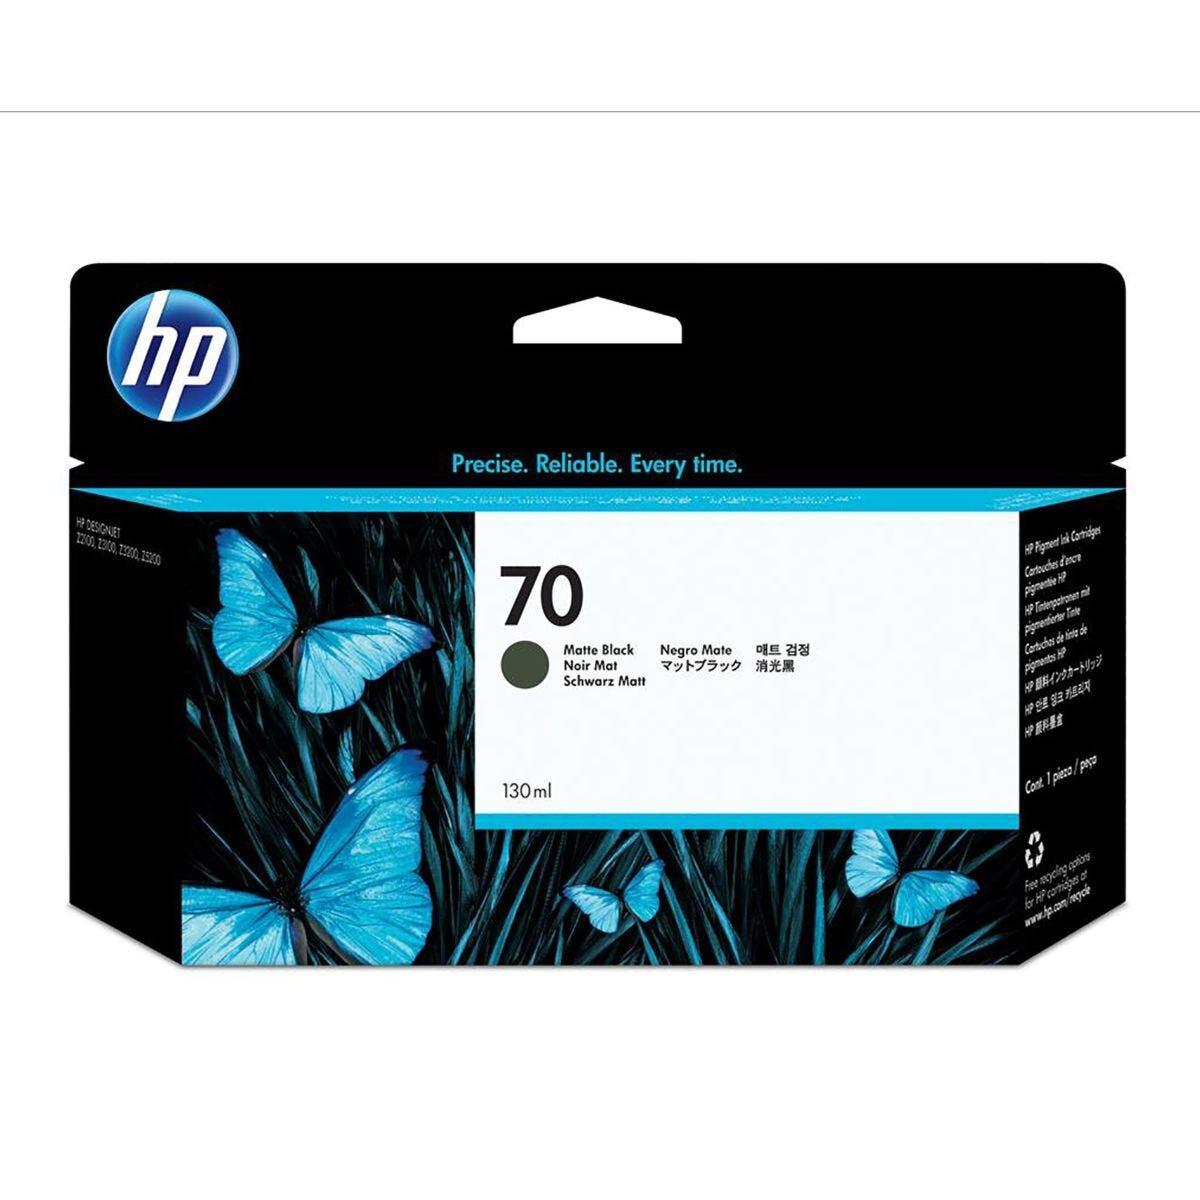 HP 70 Matte Black Original Ink Cartridge